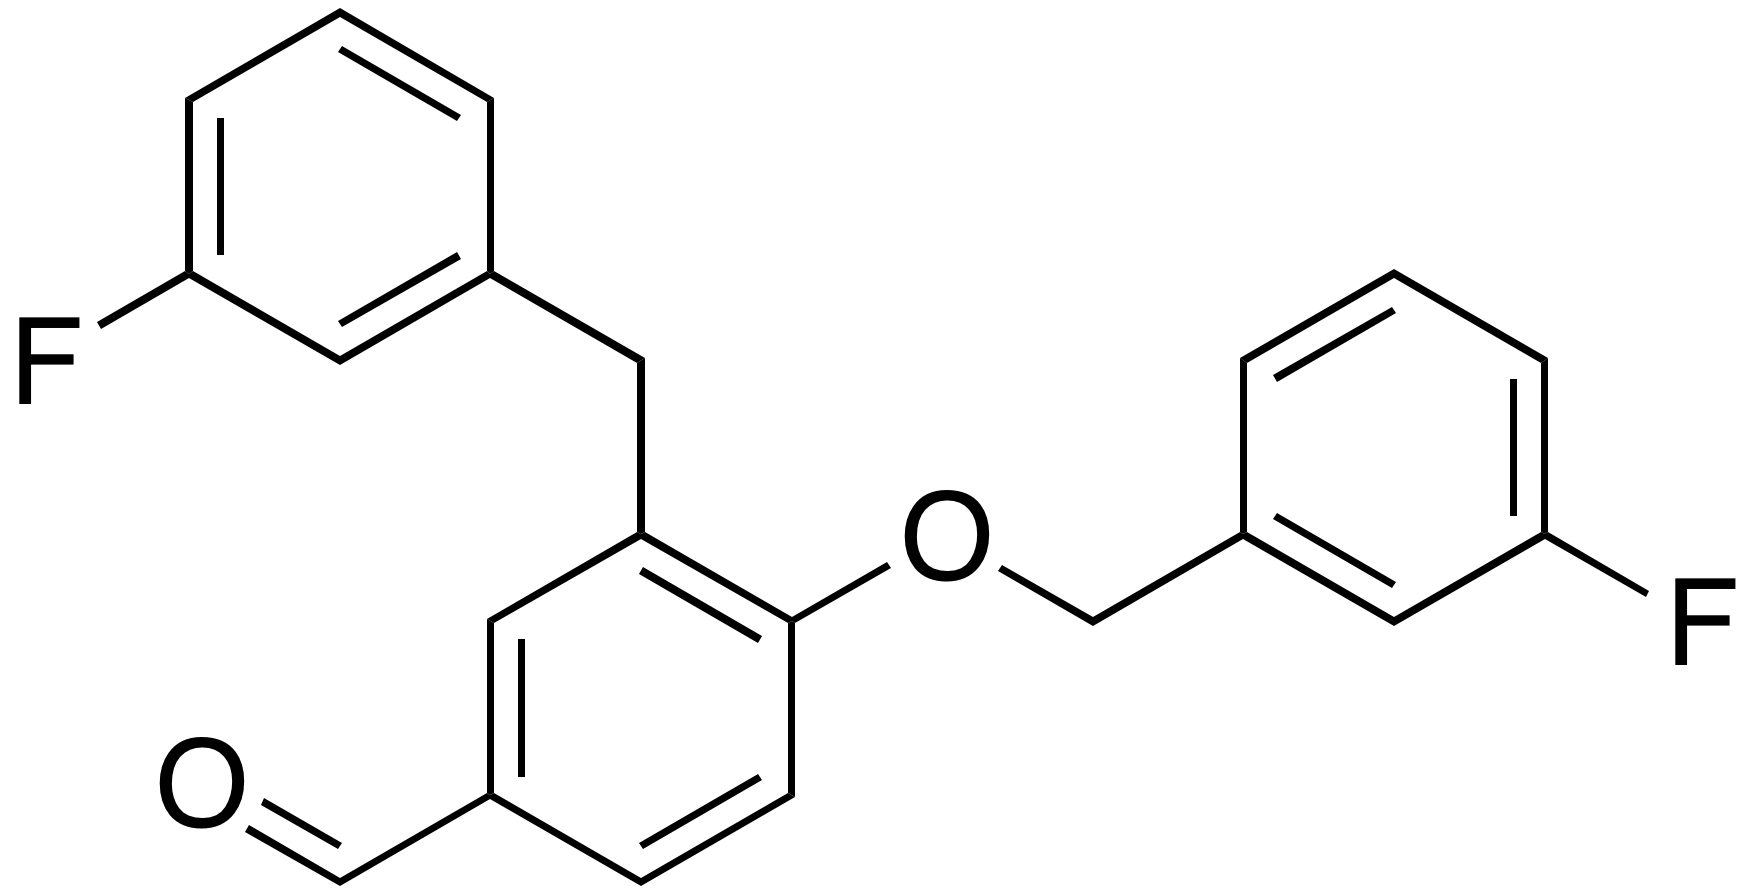 3-(3-Fluorobenzyl)-4-[(3-fluorobenzyl)oxy]benzaldehyde